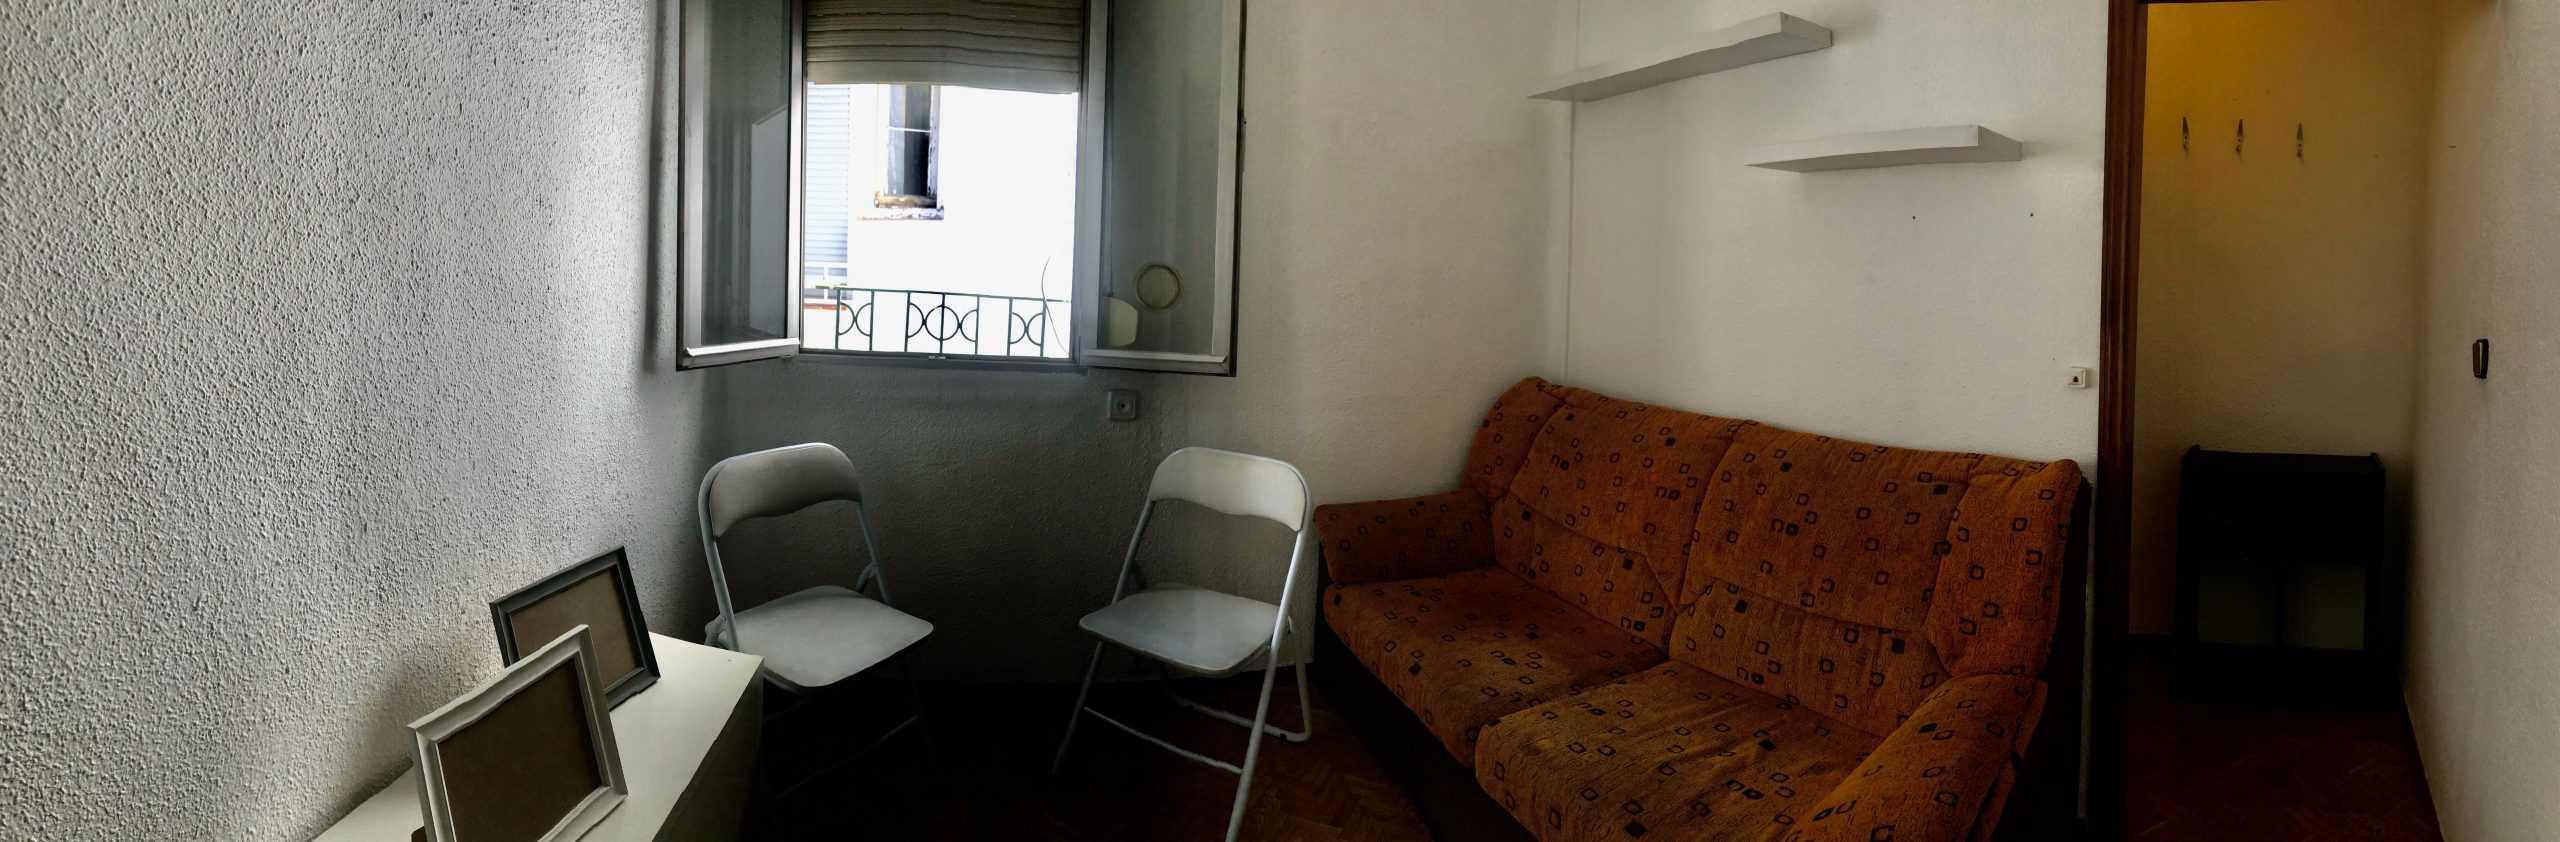 Agencia Inmobiliaria de Madrid-FUTUROCASA-Zona ARGANZUELA-EMBAJADORES-LEGAZPI -calle Embajadores- salon 3